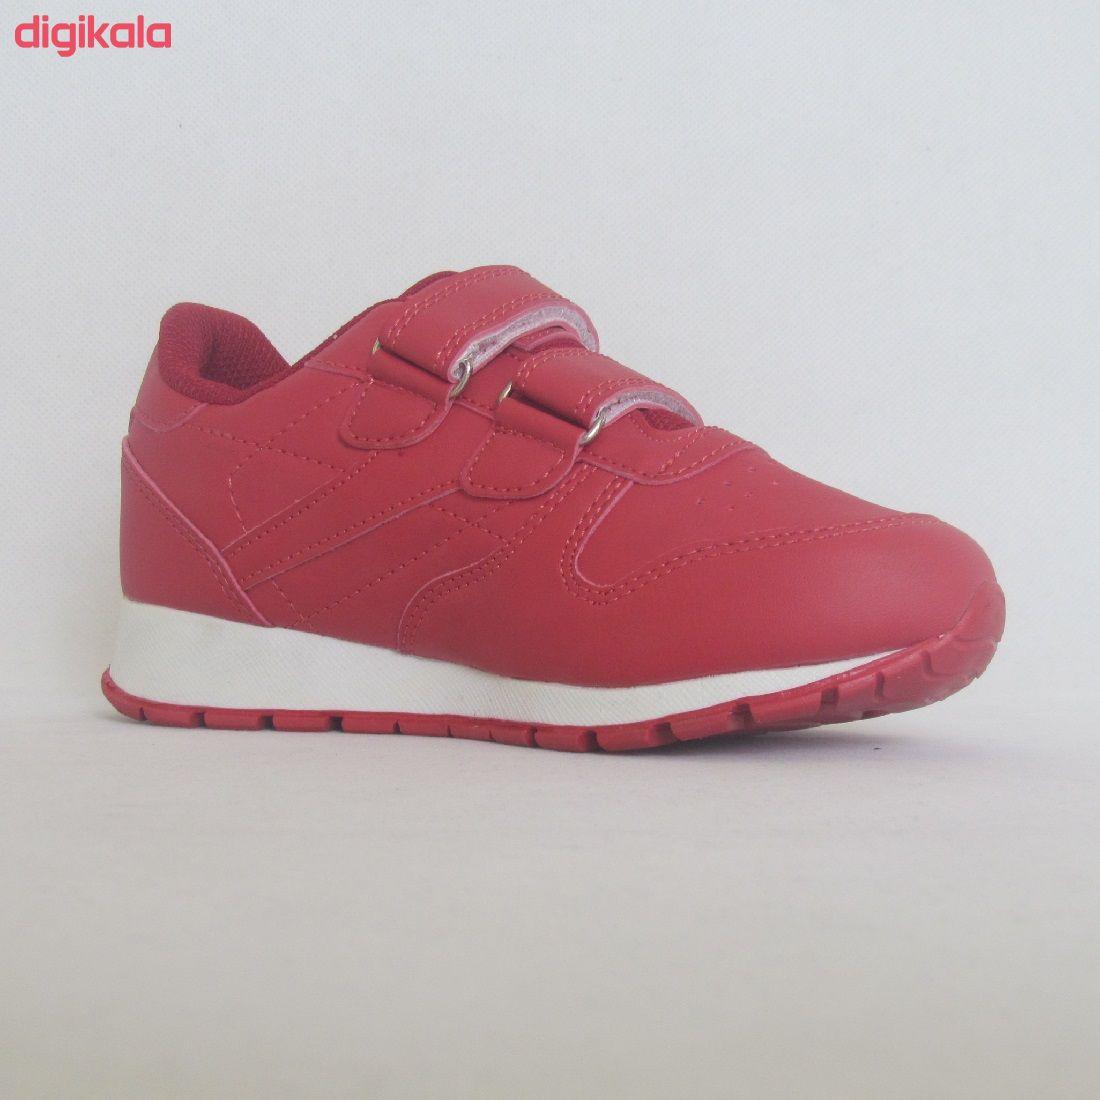 کفش مخصوص پیاده روی ویکو مدل 938.149 main 1 3